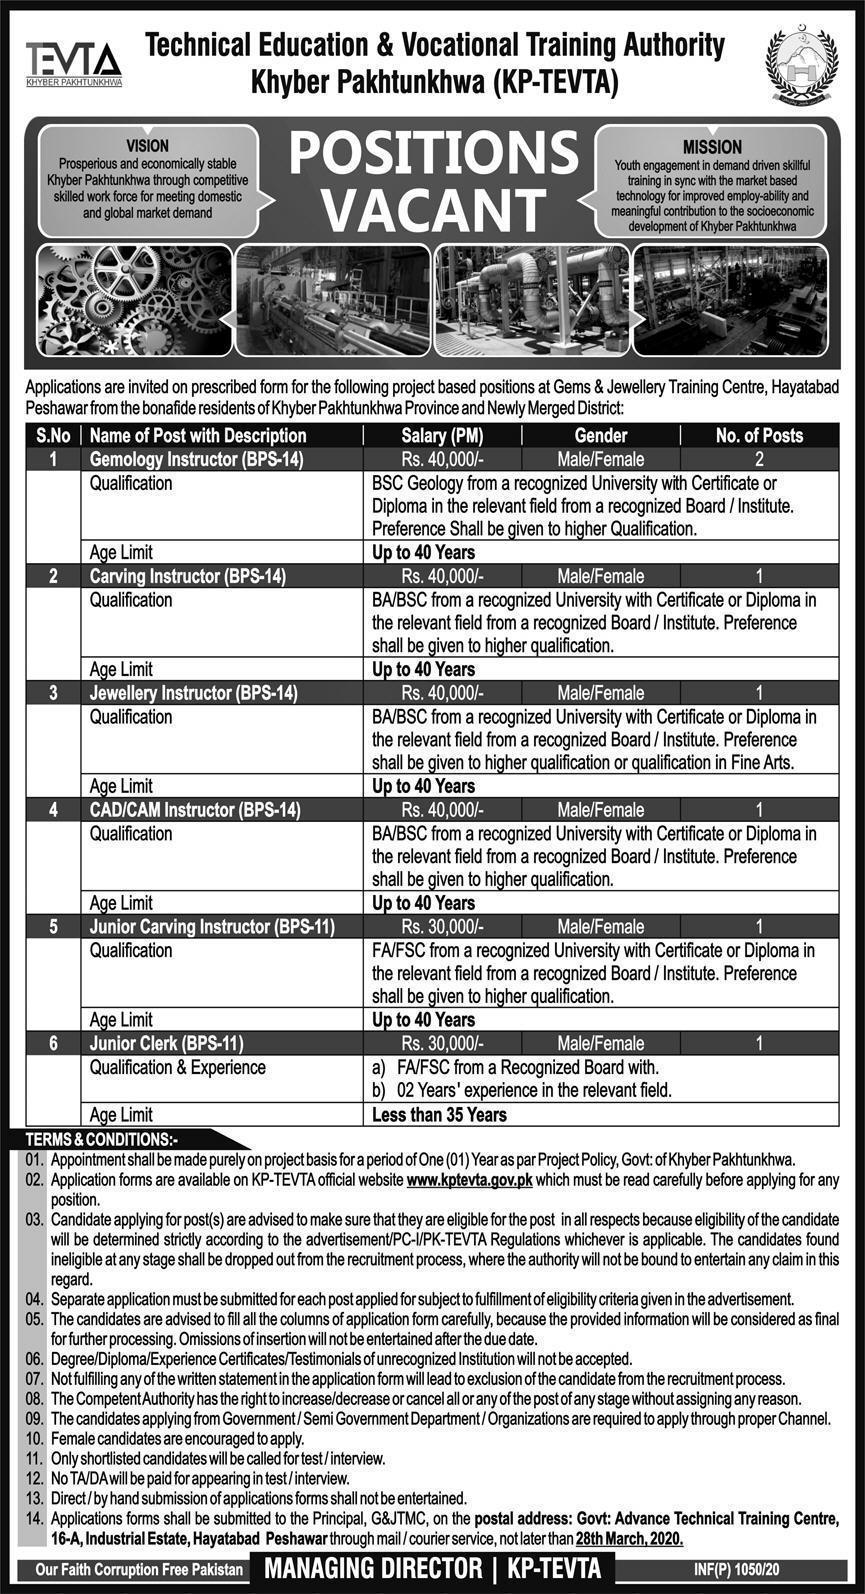 KPK TEVTA Jobs Khyber Pakhtunkhwa Technical Education Vocational Training Authority